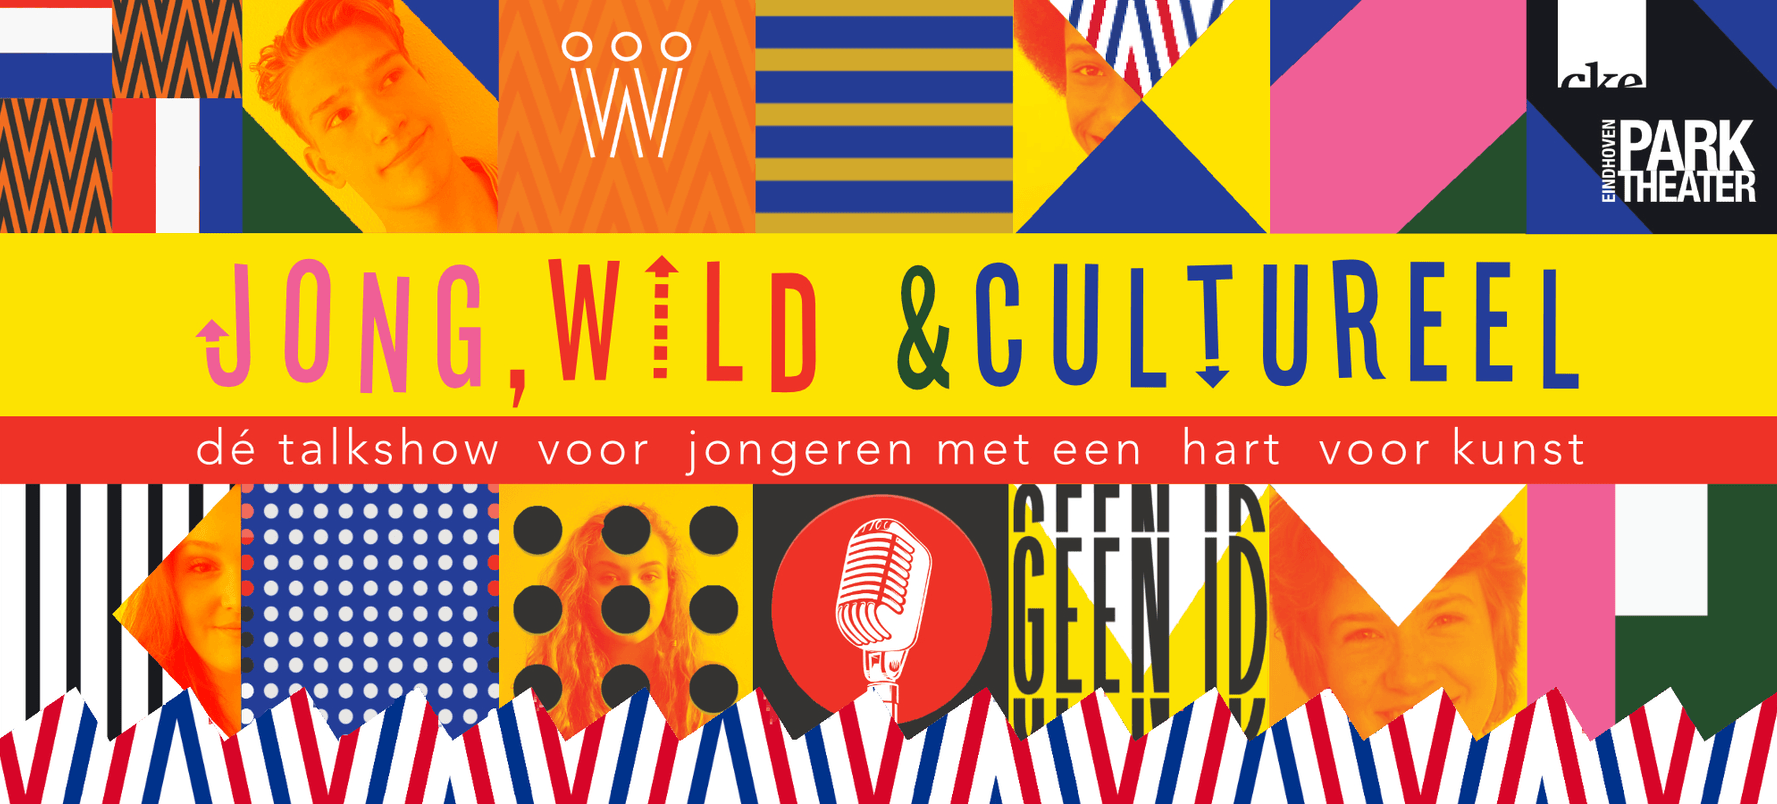 Talkshow 'Jong, wild & cultureel' krijgt prominente plek op Koningsdag